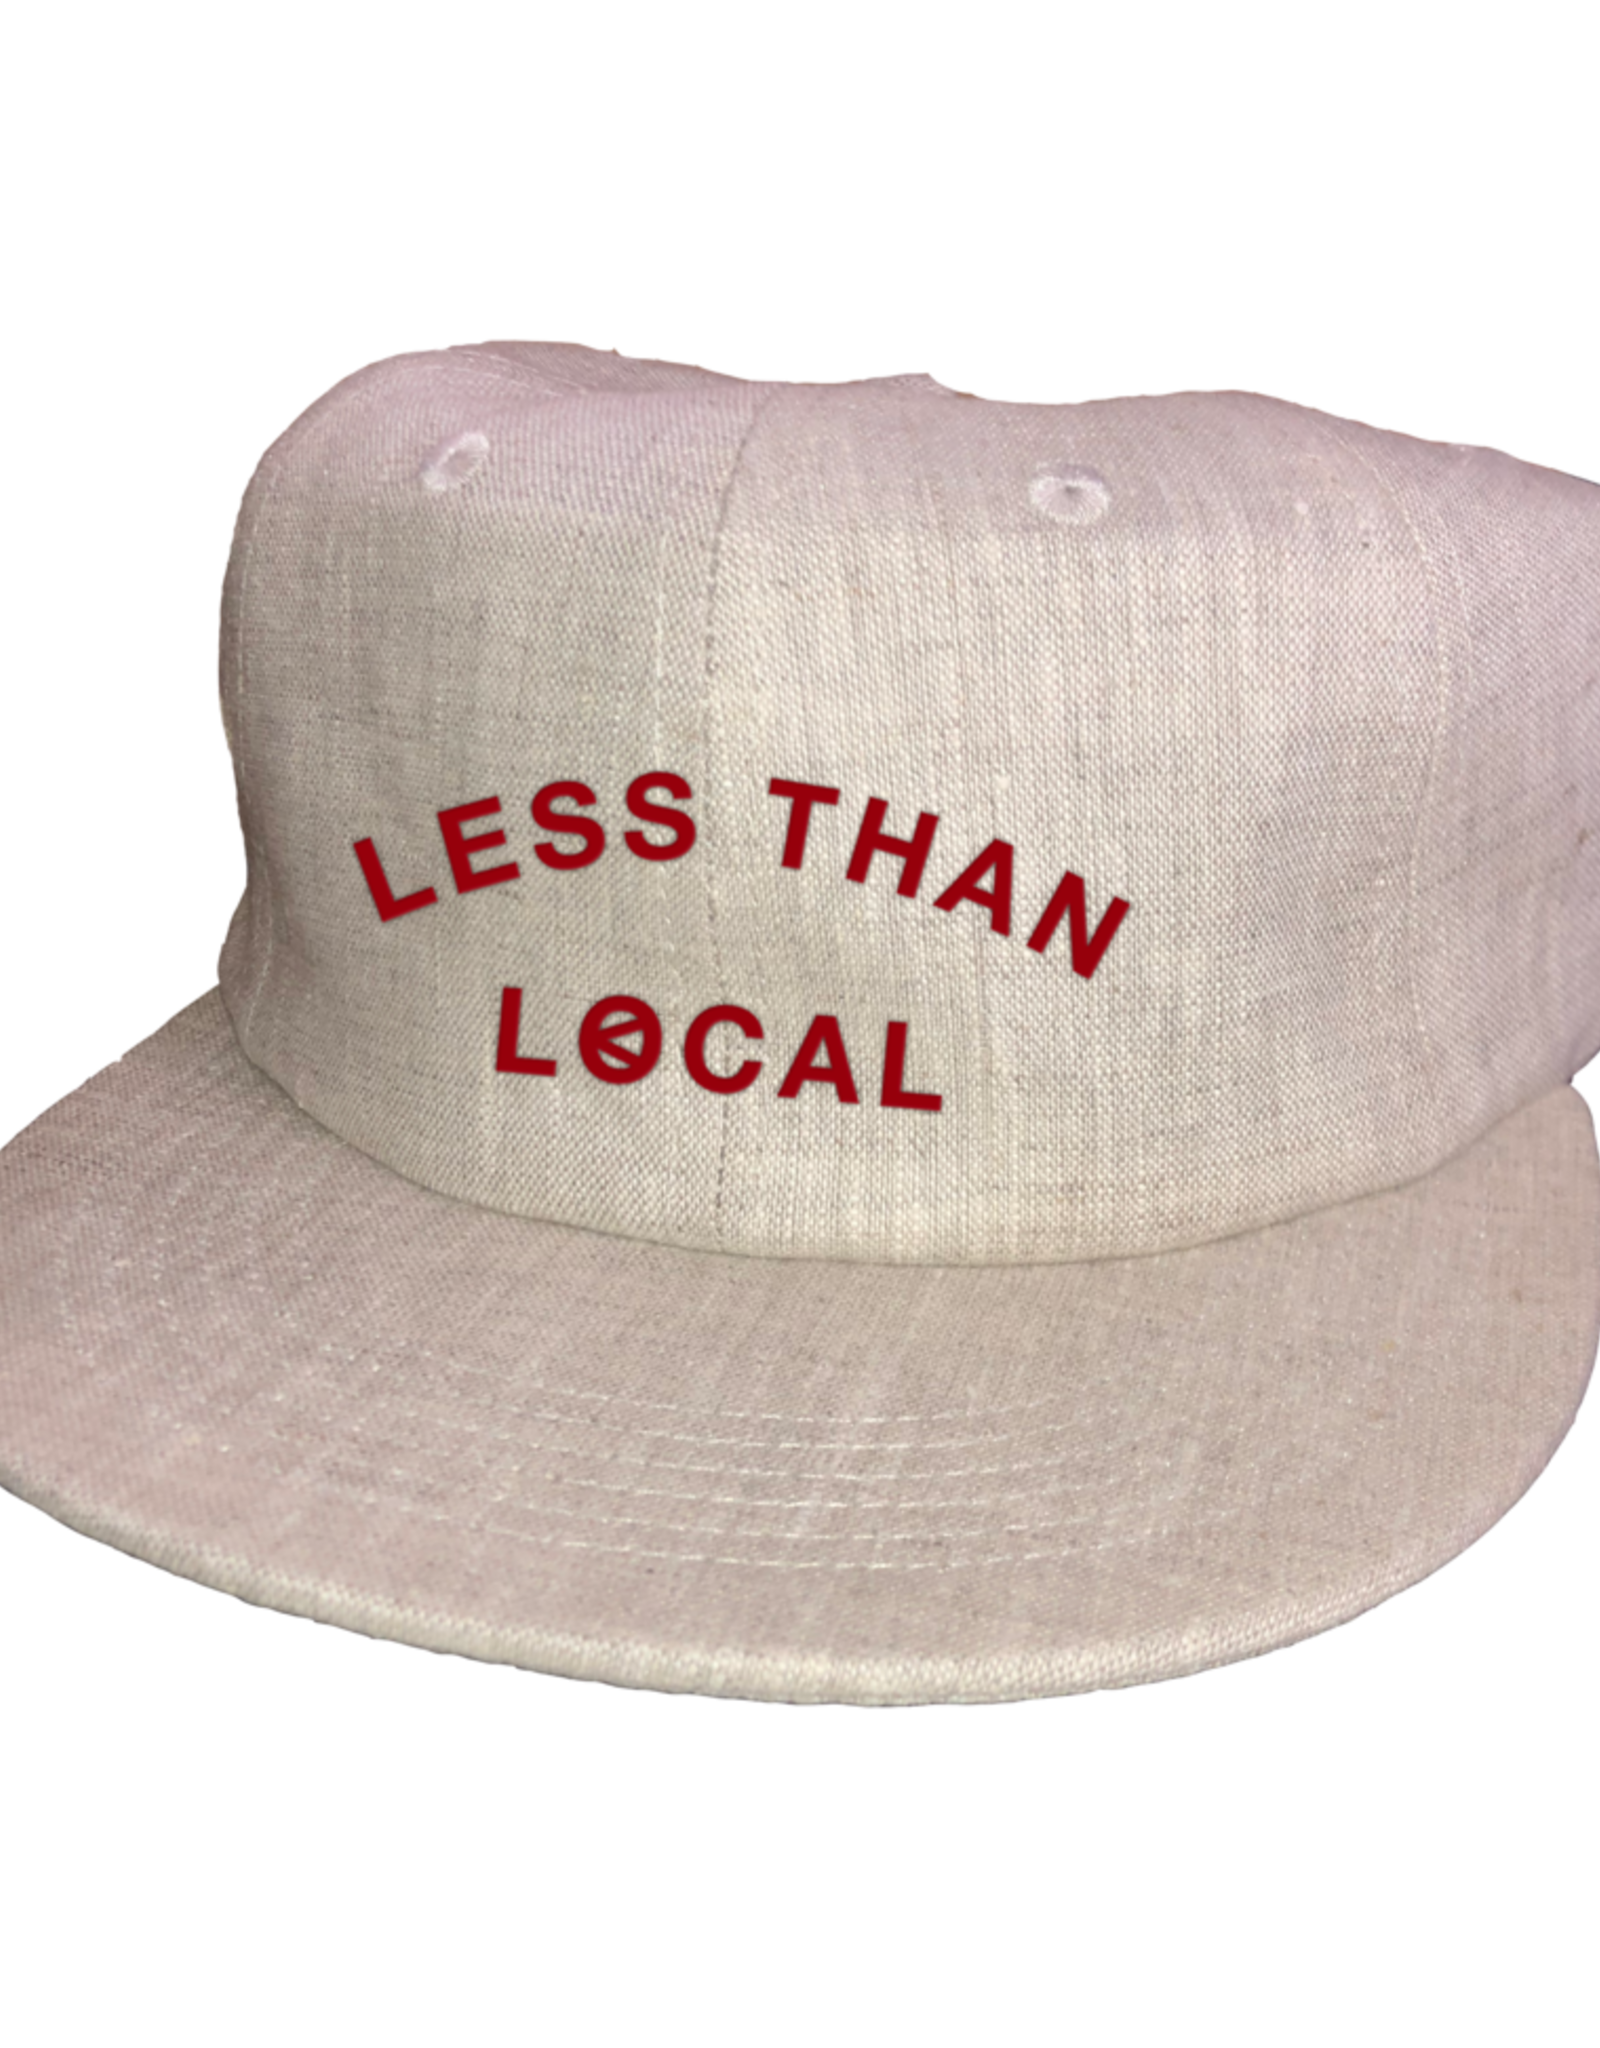 LESS THAN LOCAL LESS THAN LOCAL LINEN ARC HAT